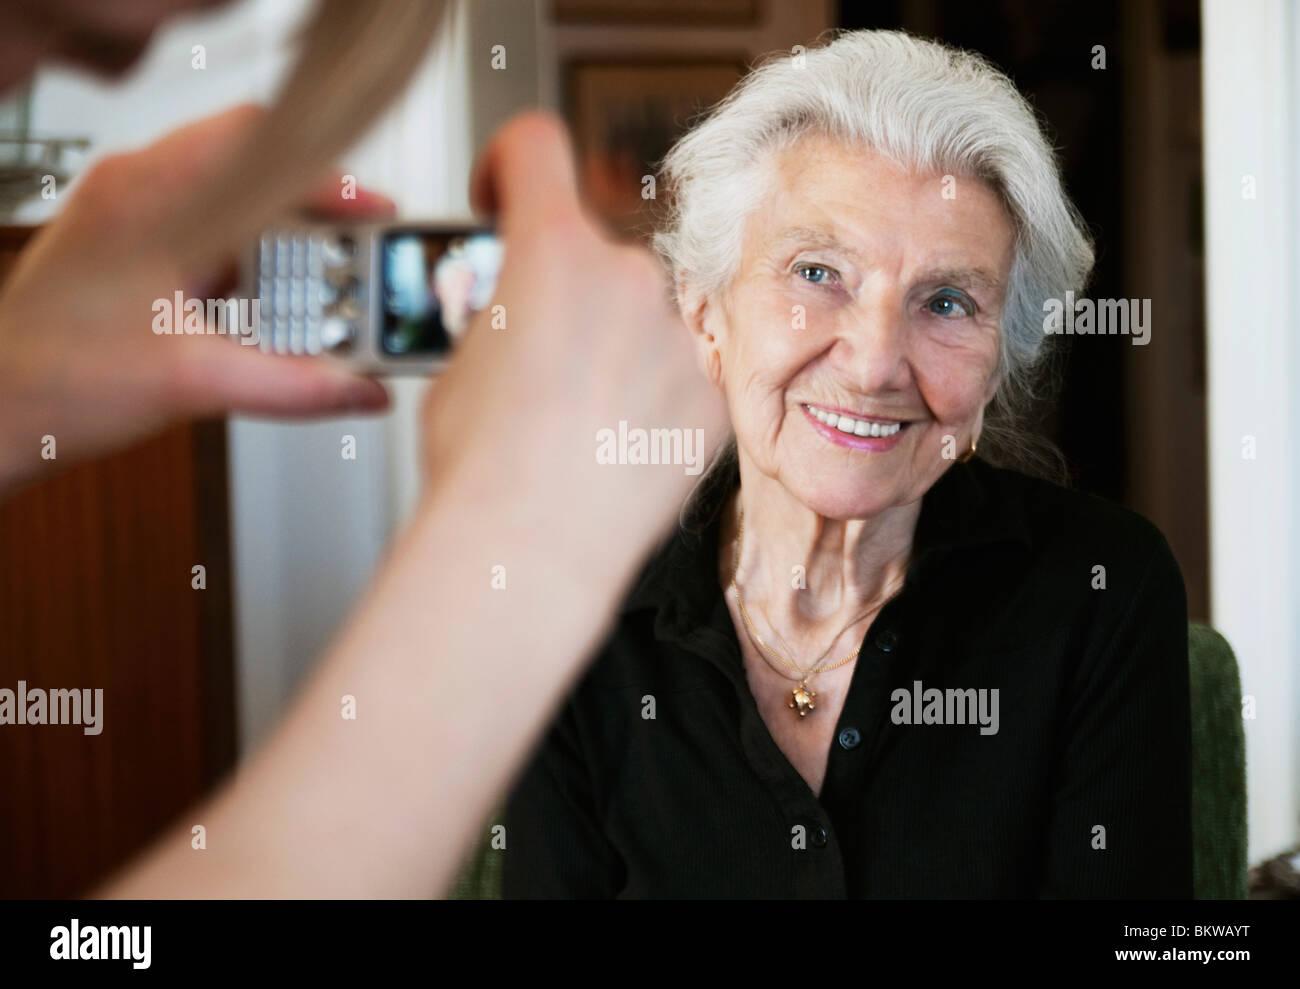 Woman taking photos avec camera phone Photo Stock